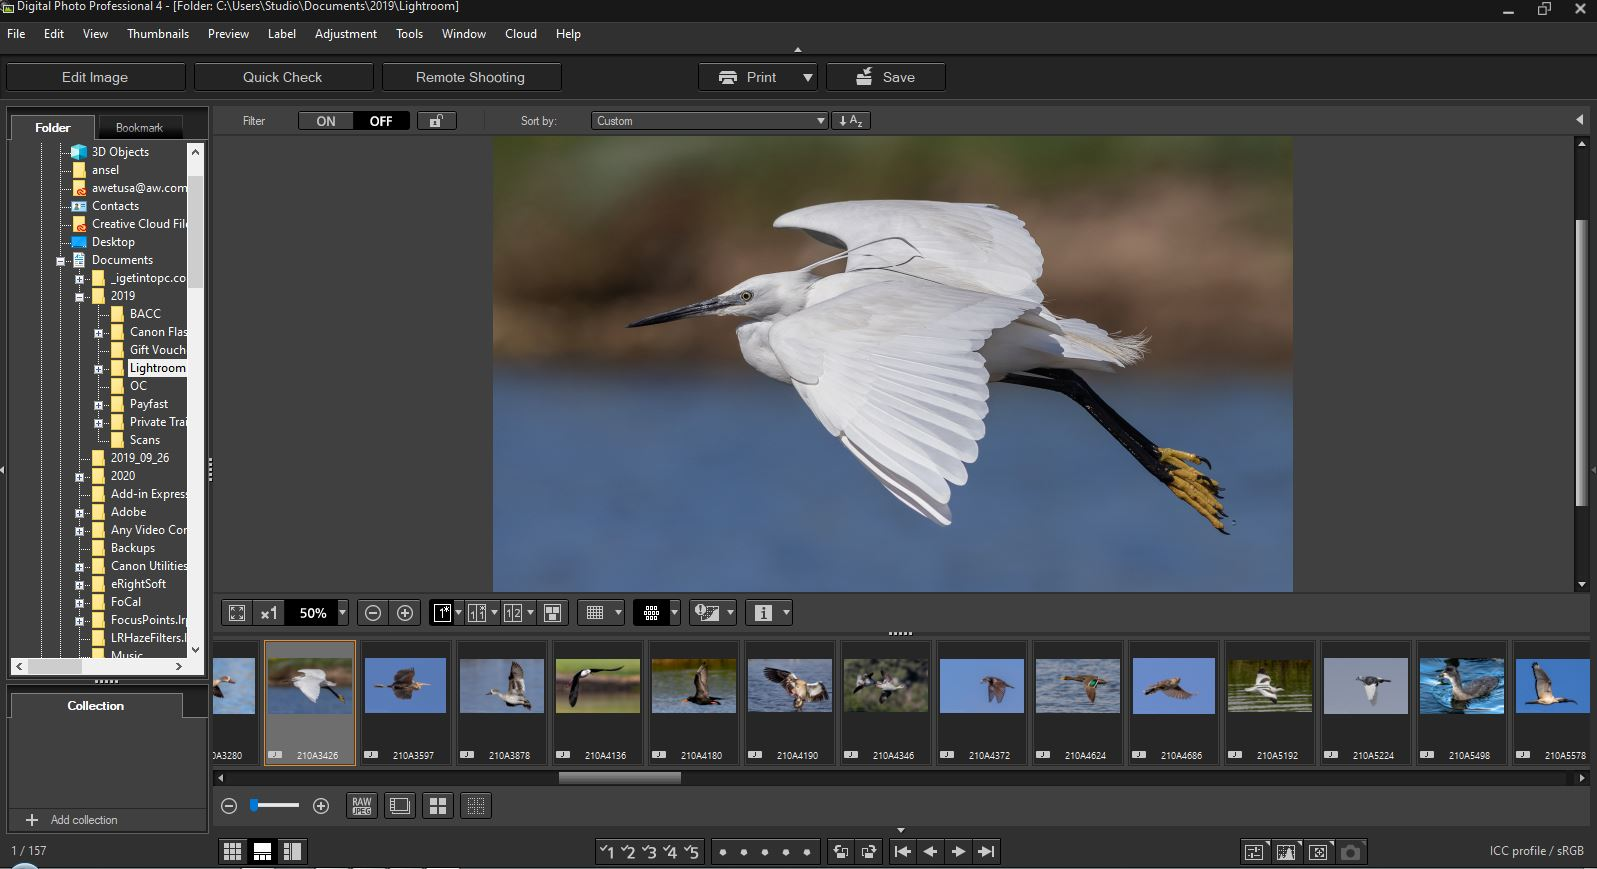 Canon digital professional 4 manual mac os